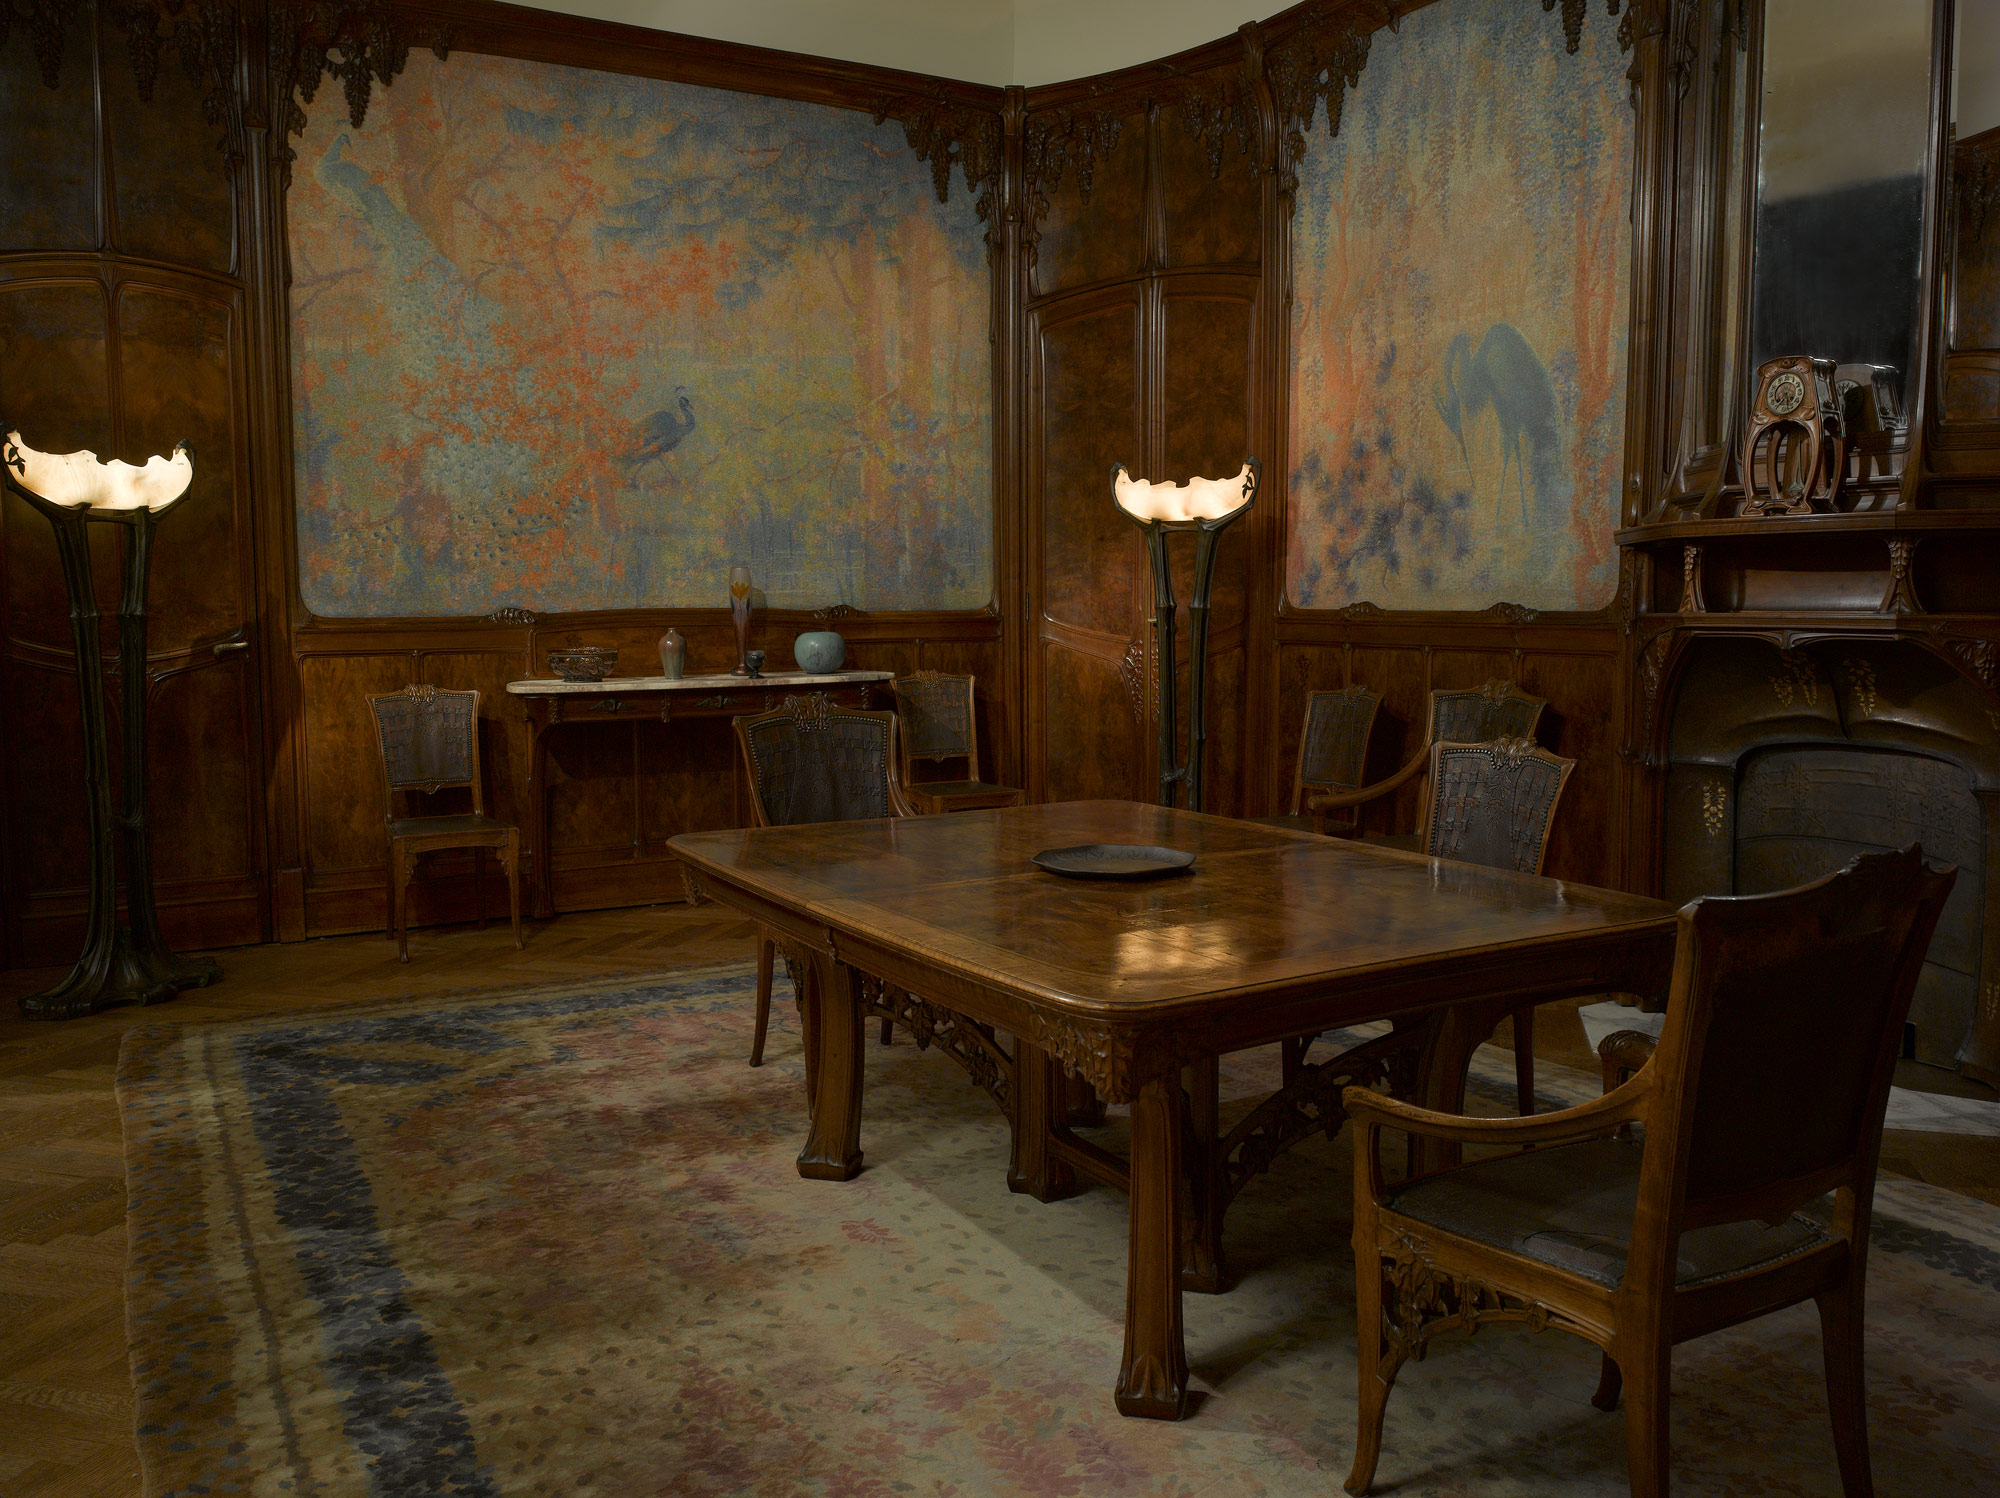 wisteria room | lucien lévy-dhurmer | 66.244.1-.25 | work of art